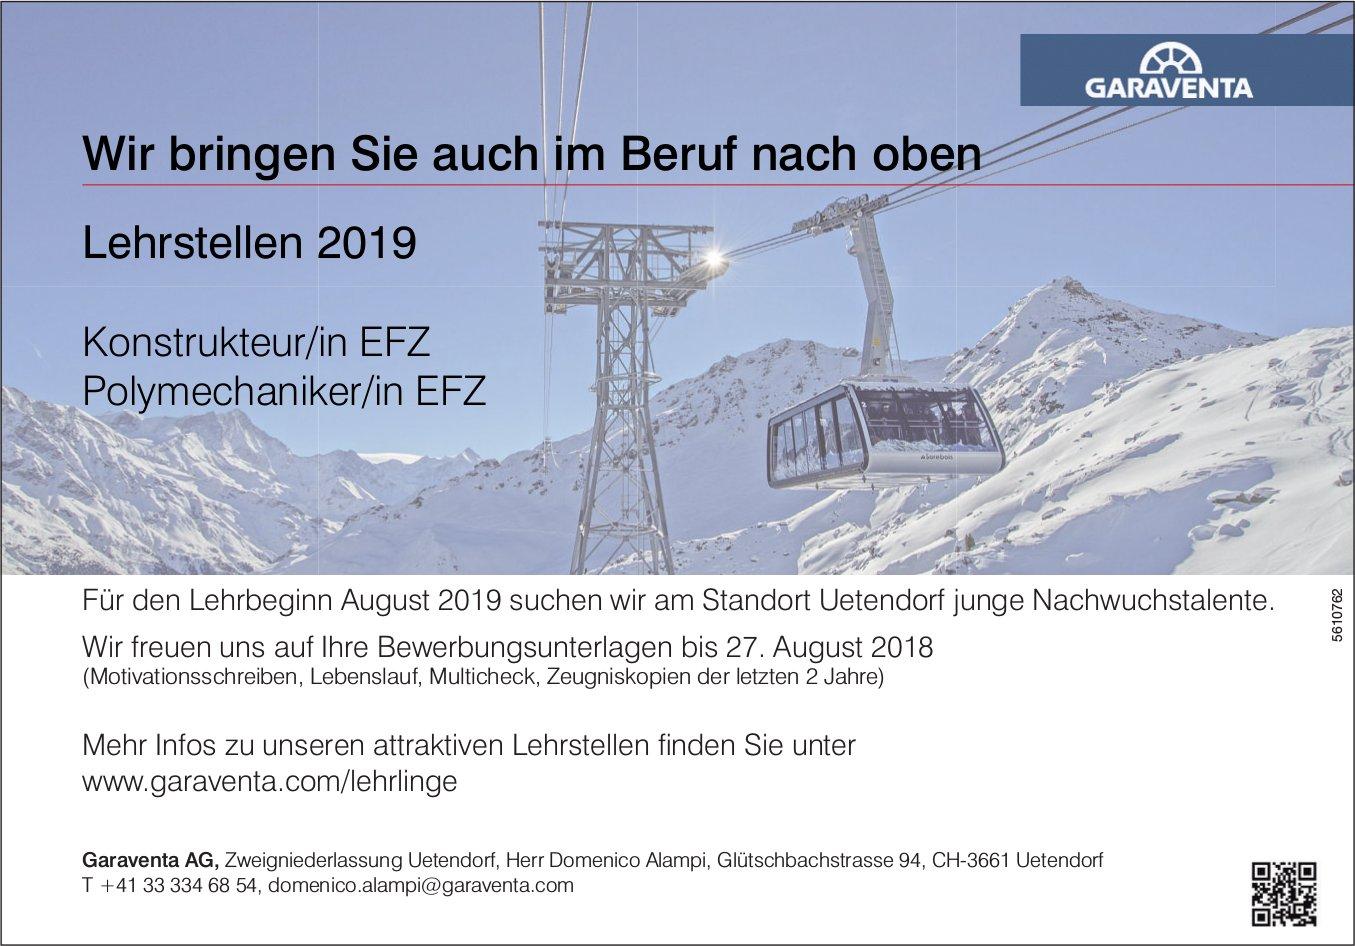 Lehrstellen 2019, Konstrukteur/in EFZ & Polymechaniker/in EFZ, Garaventa AG, Uetendorf